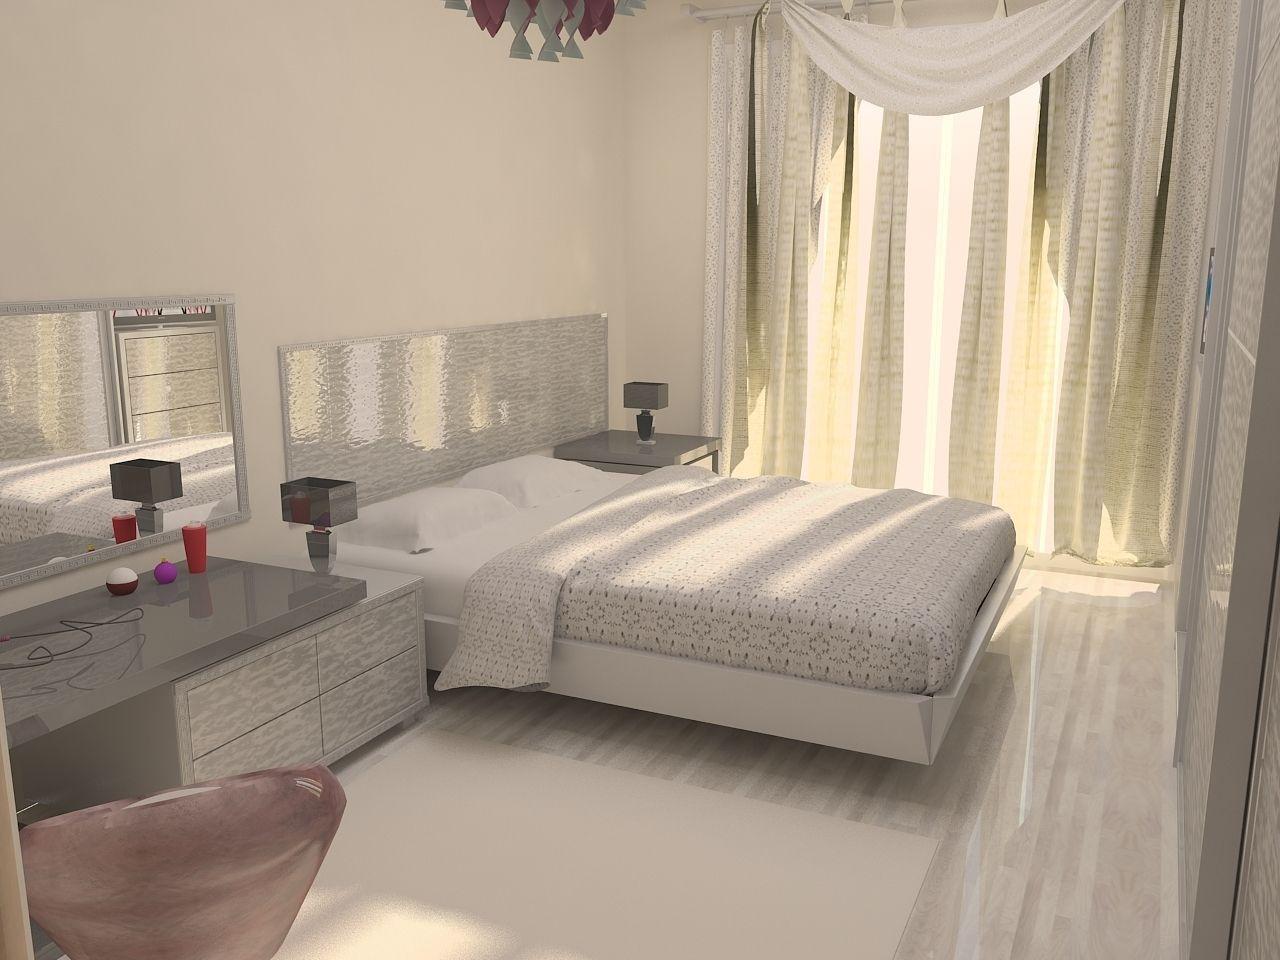 Bedroom design 3D Model MAX   CGTrader.com on Model Bedroom Design  id=16015